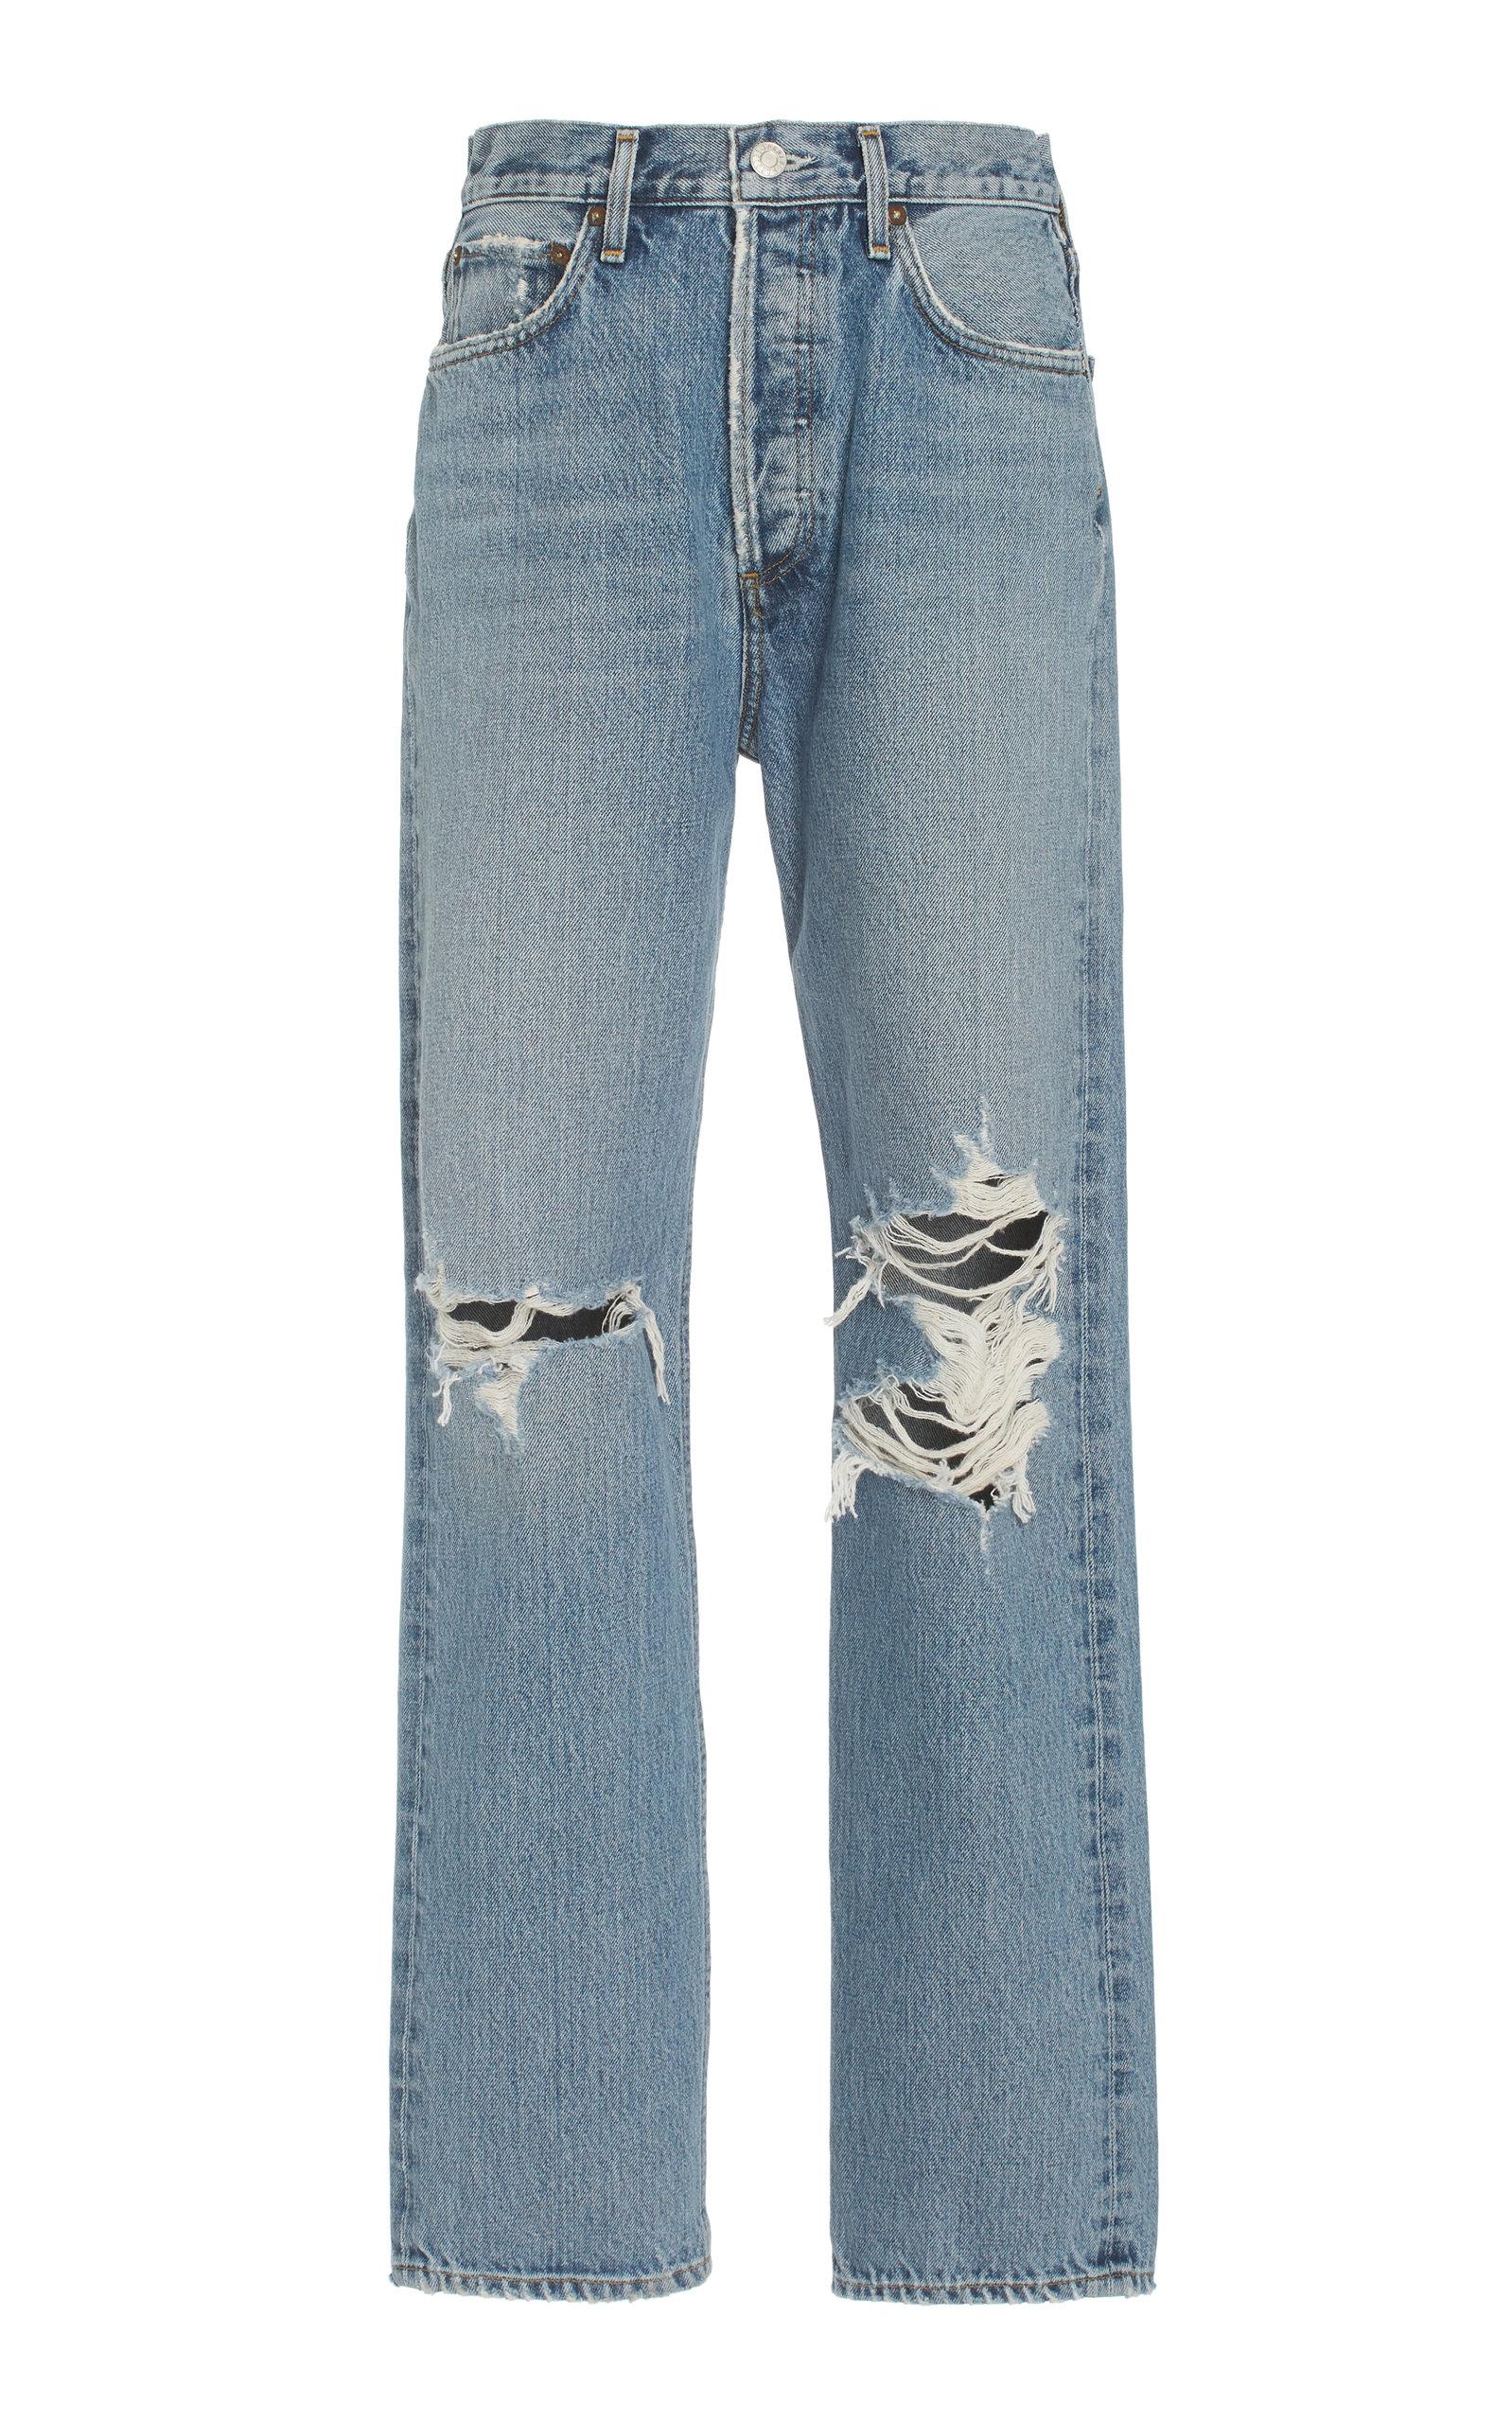 Agolde - Women's 90's Pinch-Waist Rigid High-Rise Organic Cotton Straight-Leg Jeans - Medium Wash - Moda Operandi